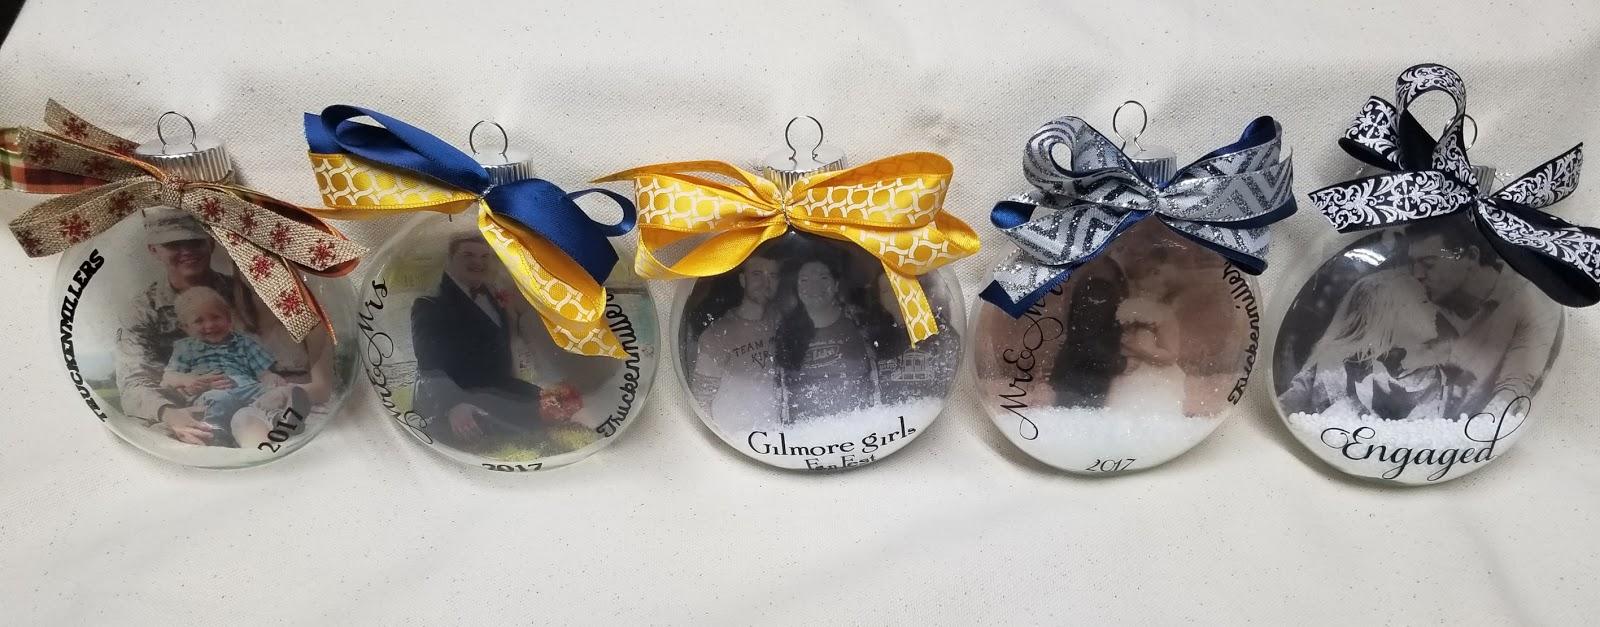 Making Christmas Ornaments Cricut Project